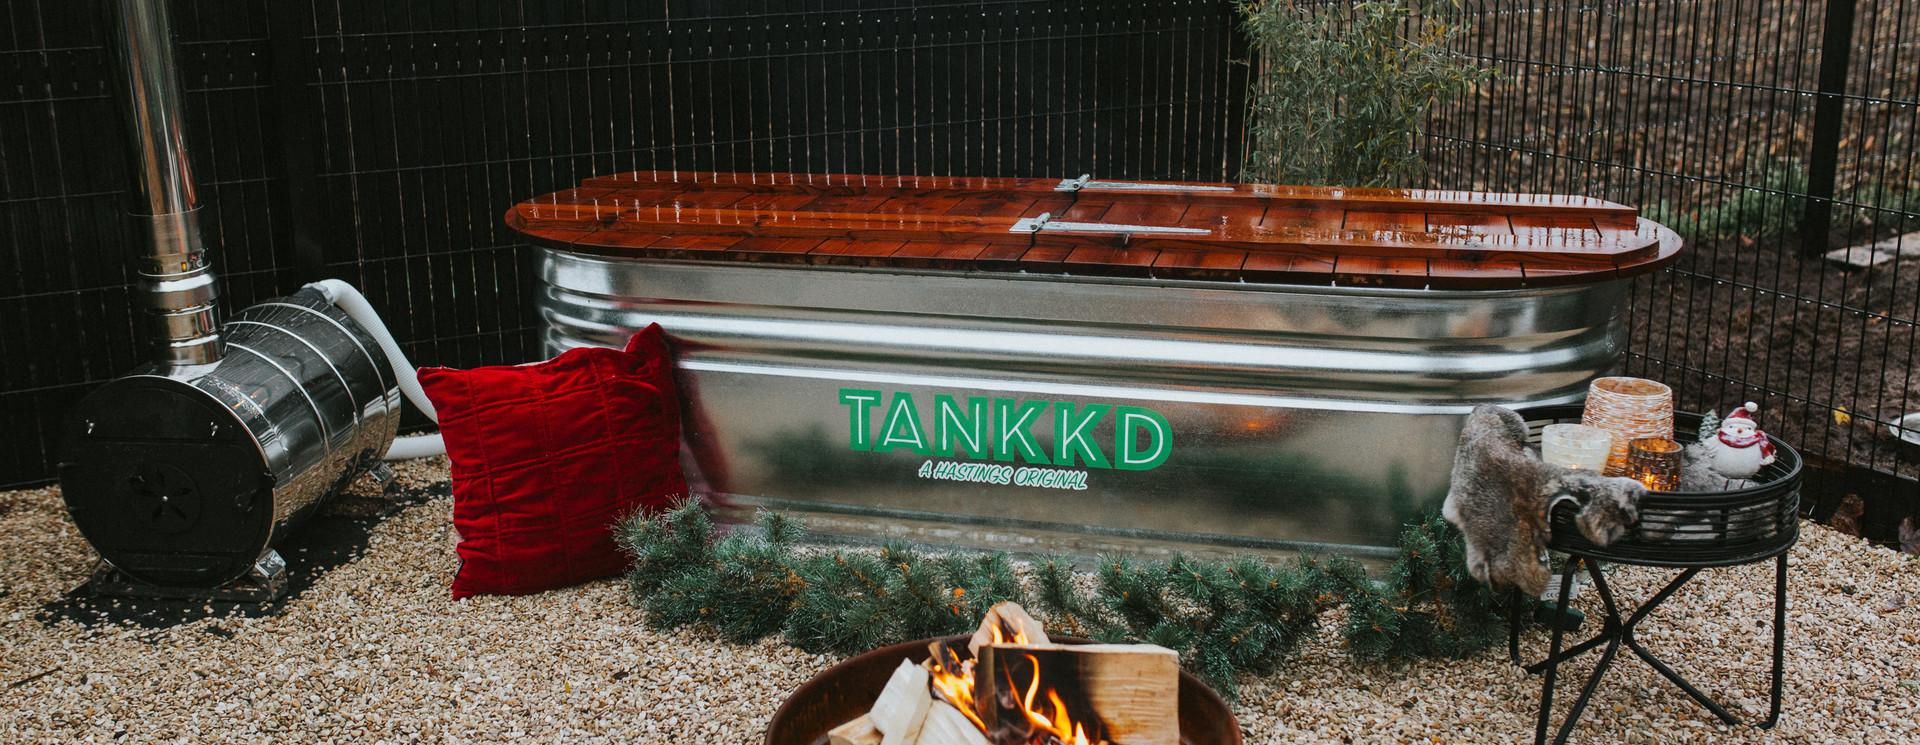 Tankkd / Hastings Ovale stock tanks Green Label